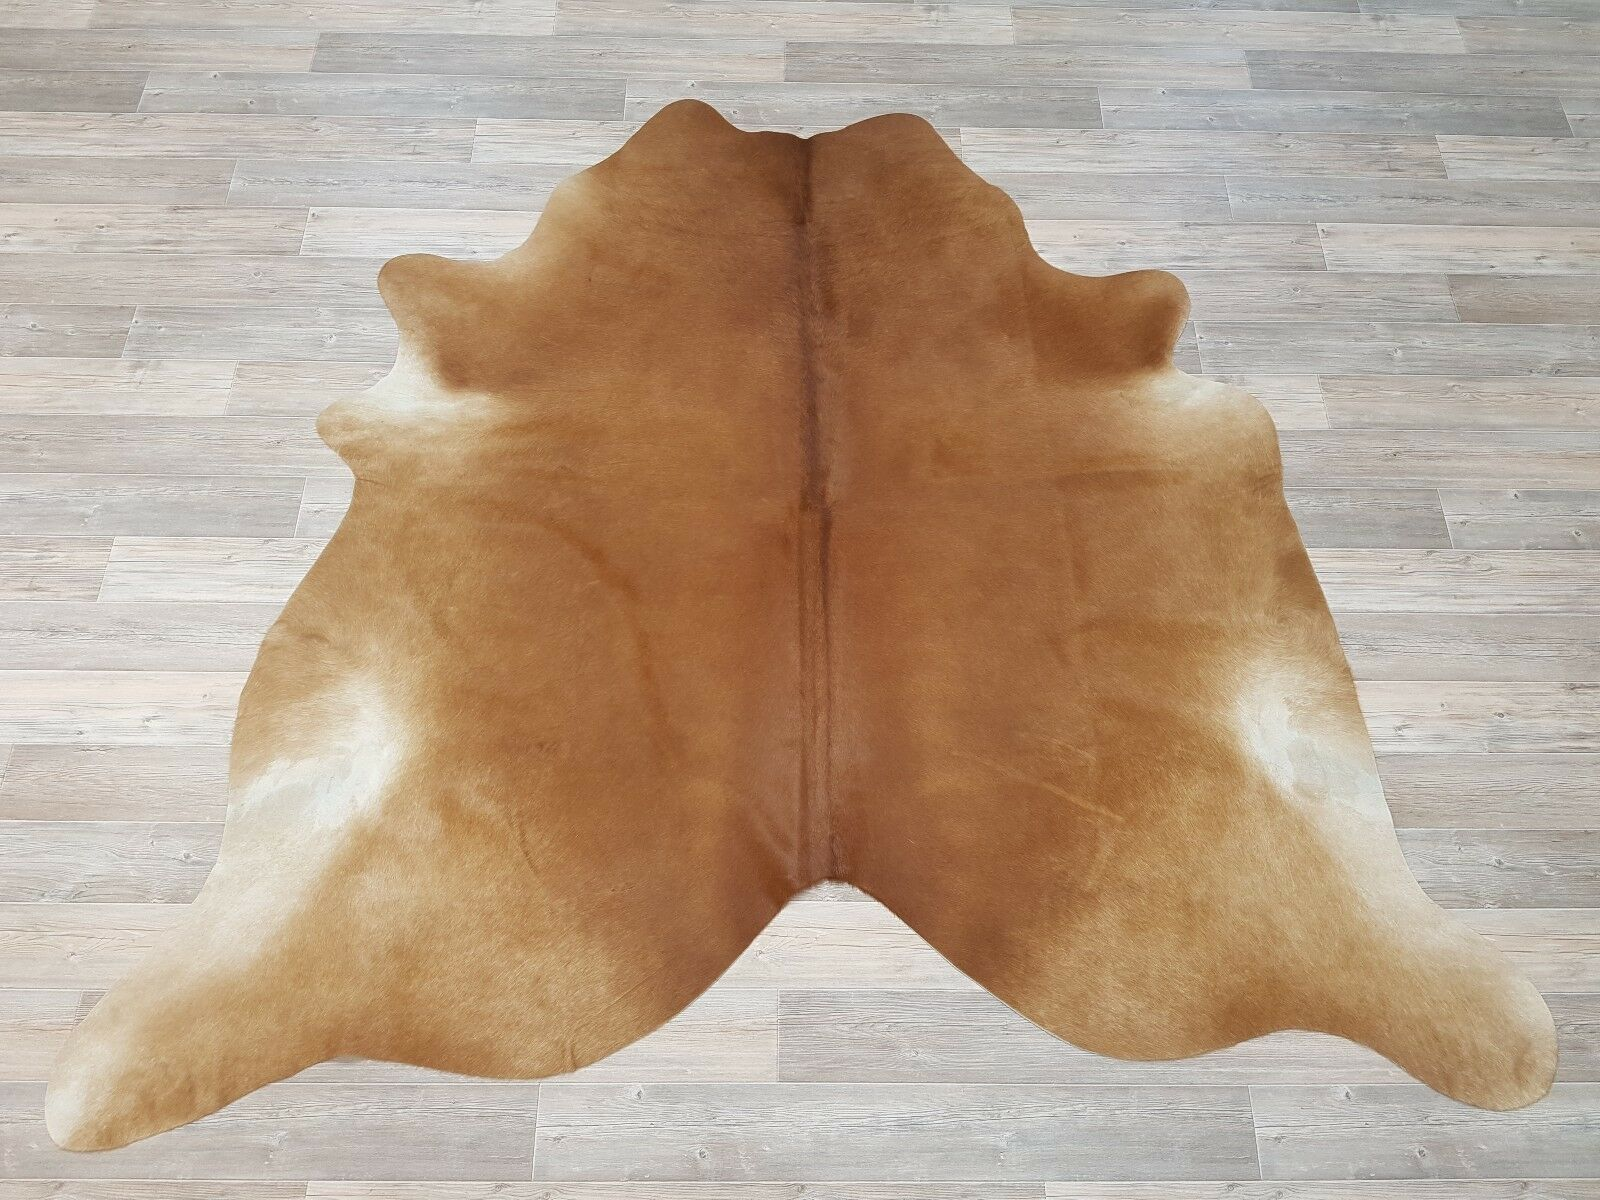 XXL Kuhfell Rinderfell Stierfell aus Brasilien Echtfell ca. 200x210cm 69